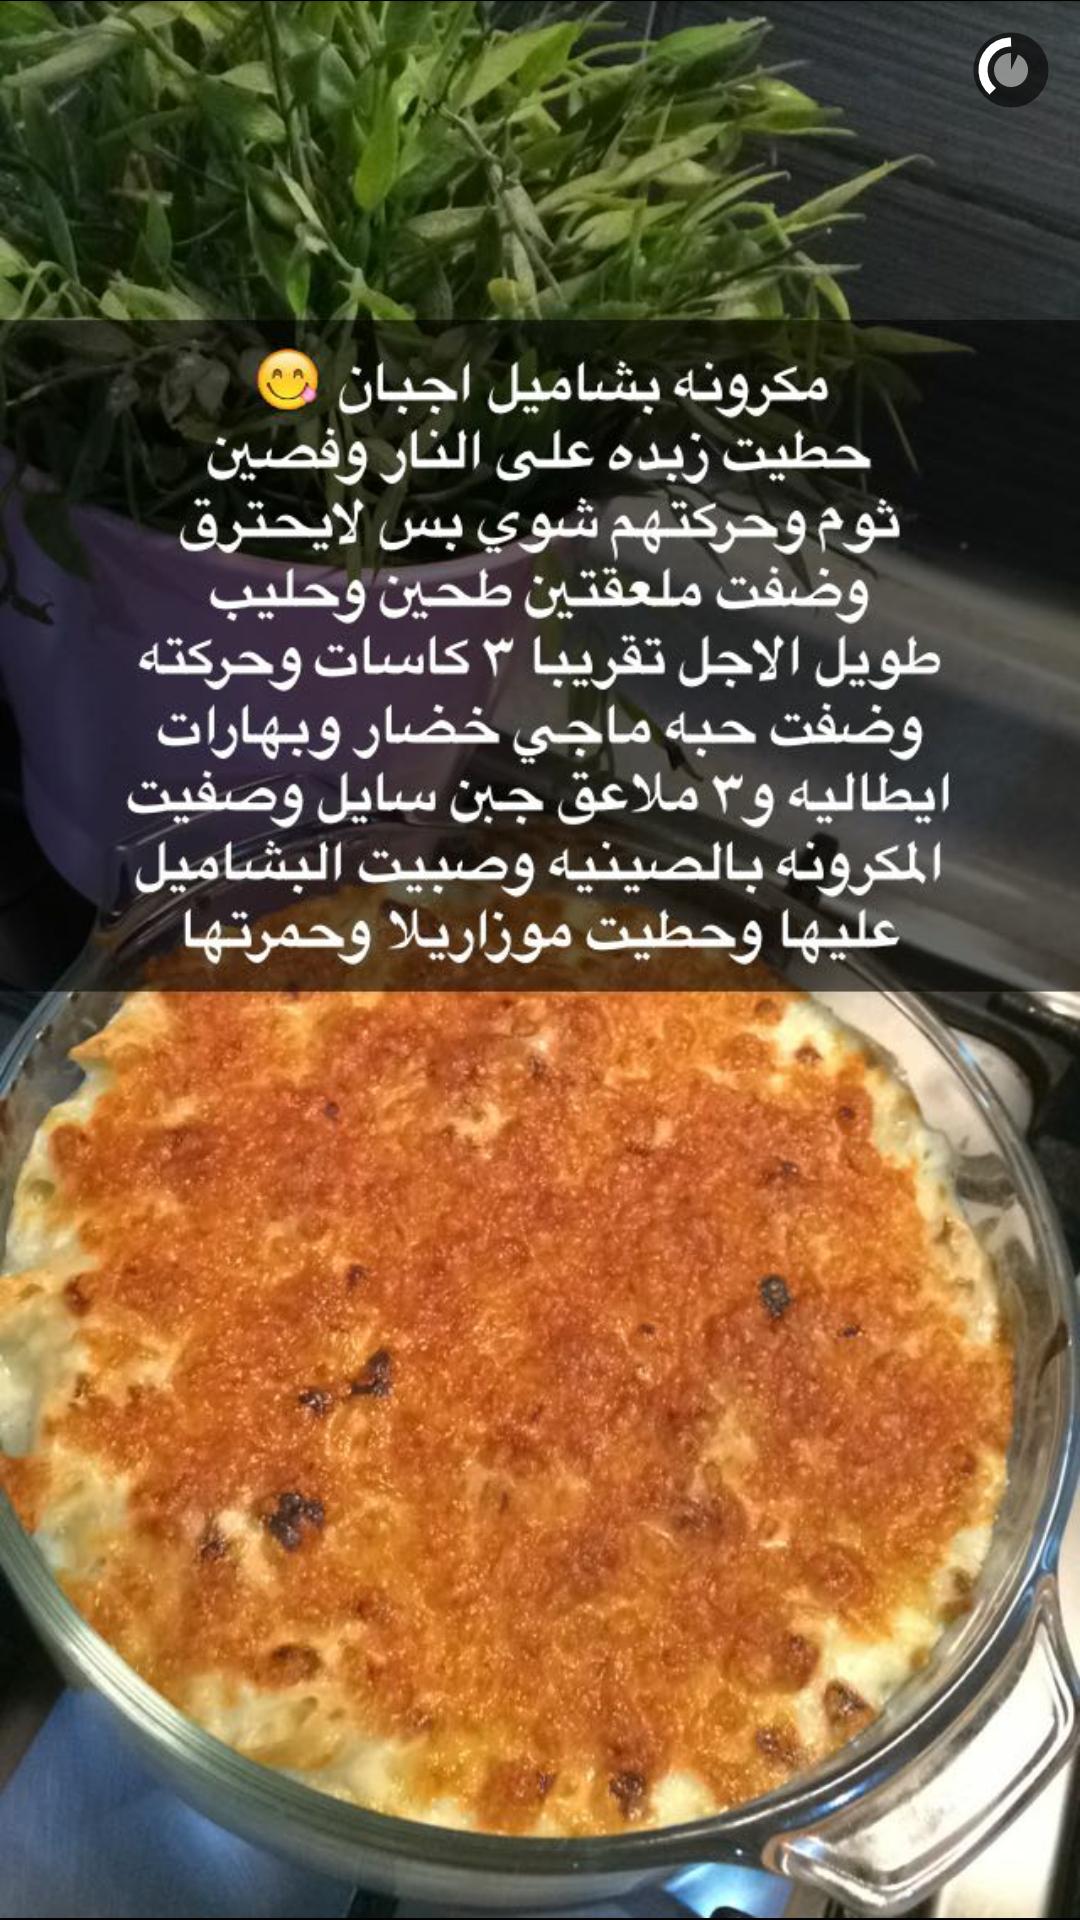 Pin By H Ash On سناكات وطبخات Food Receipes Food Recipes